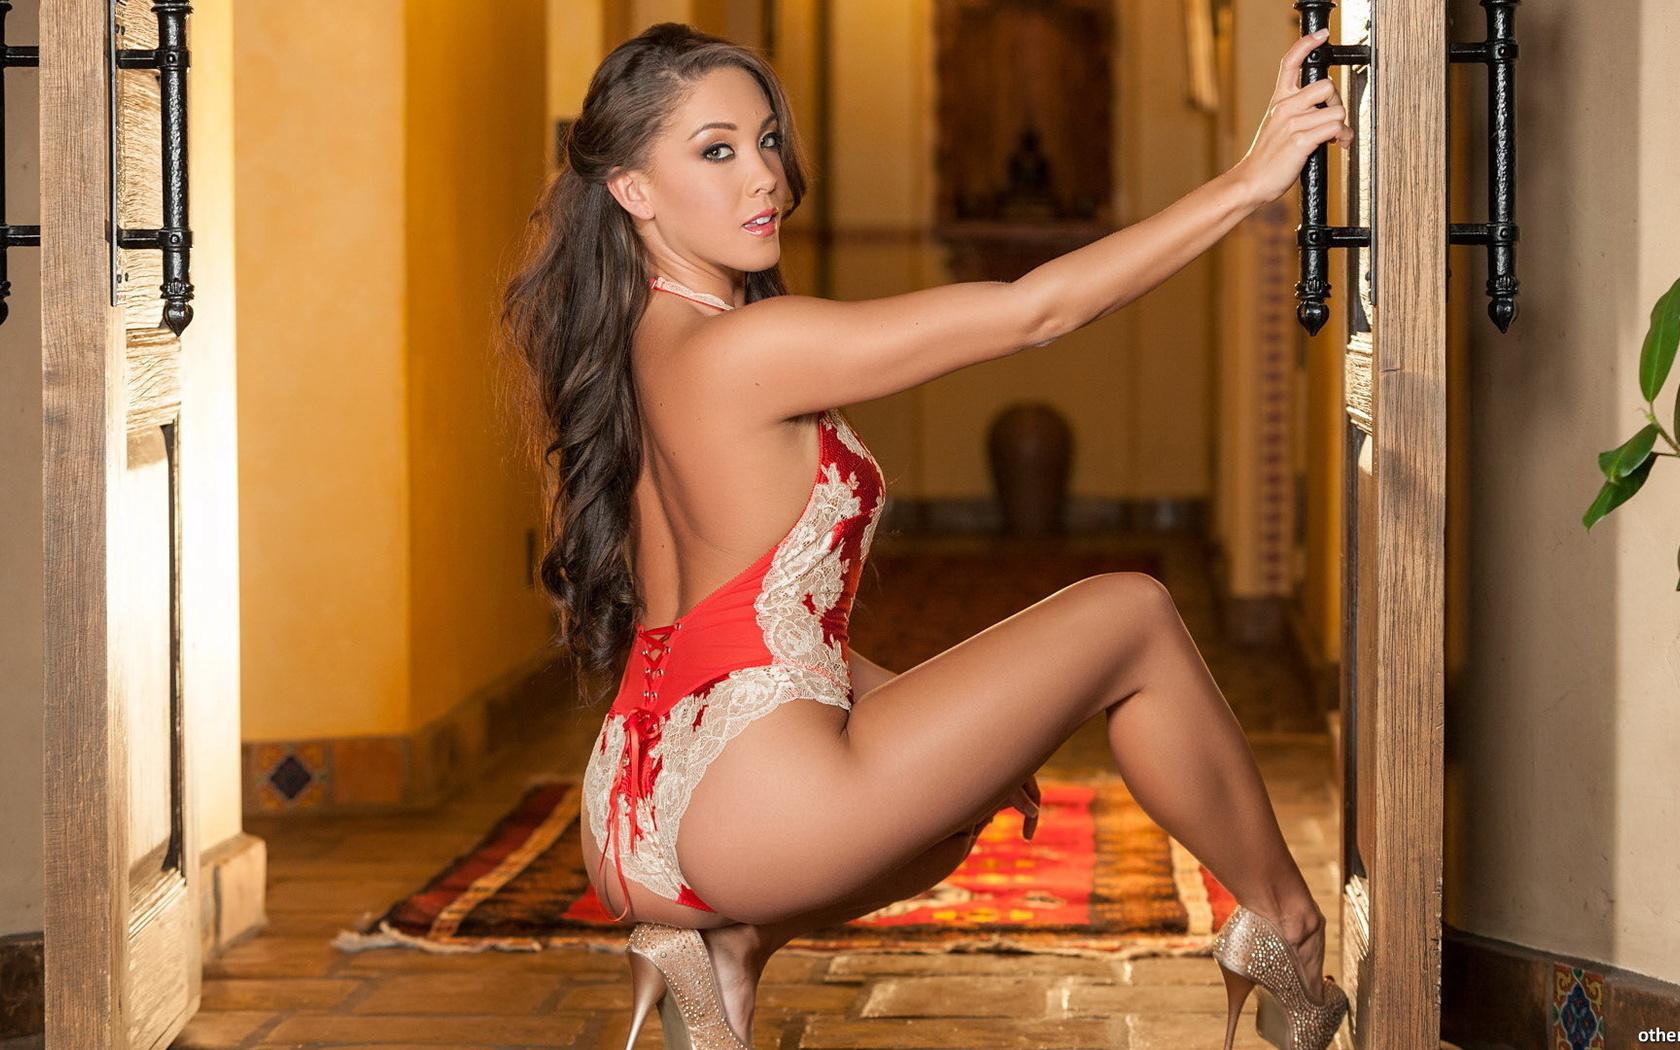 Латиноамериканки видео порно соло — 10